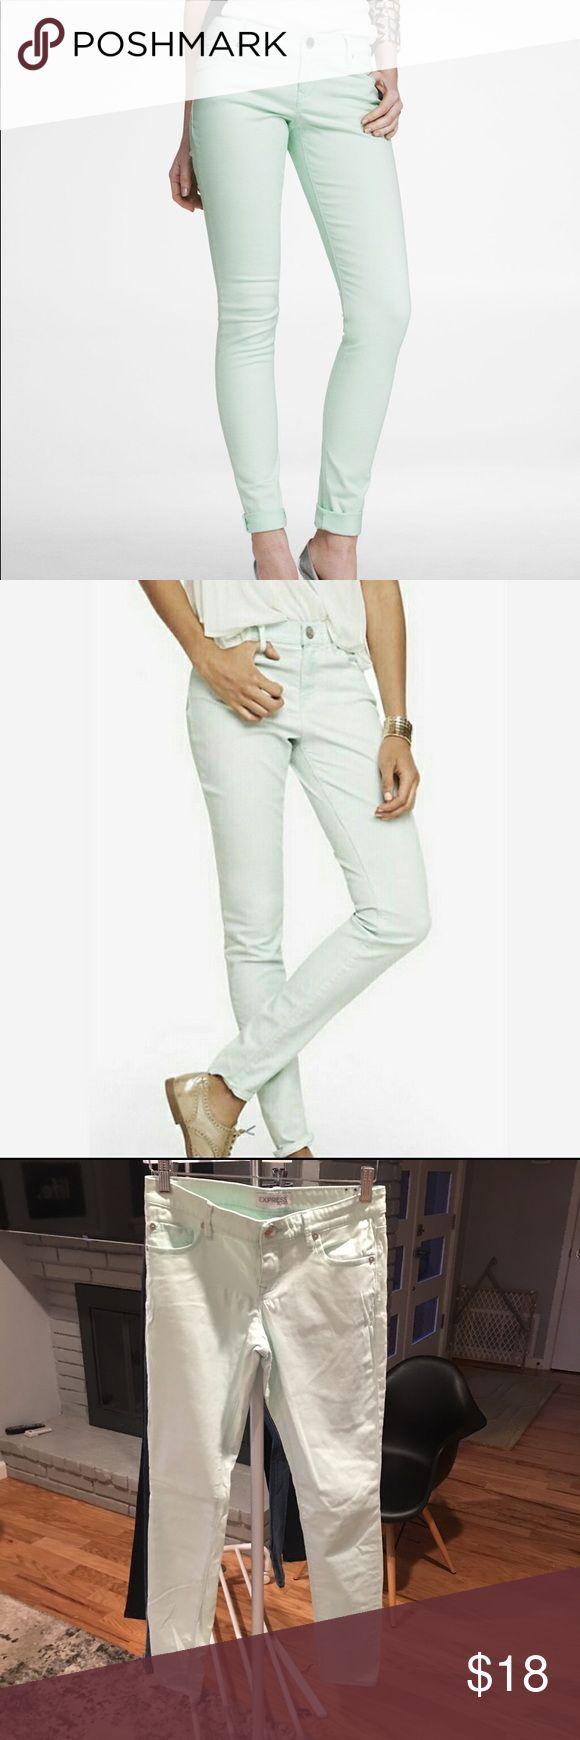 EXPRESS mint green jeans Great fit. Skinny leg. Great condition. Express Jeans Skinny